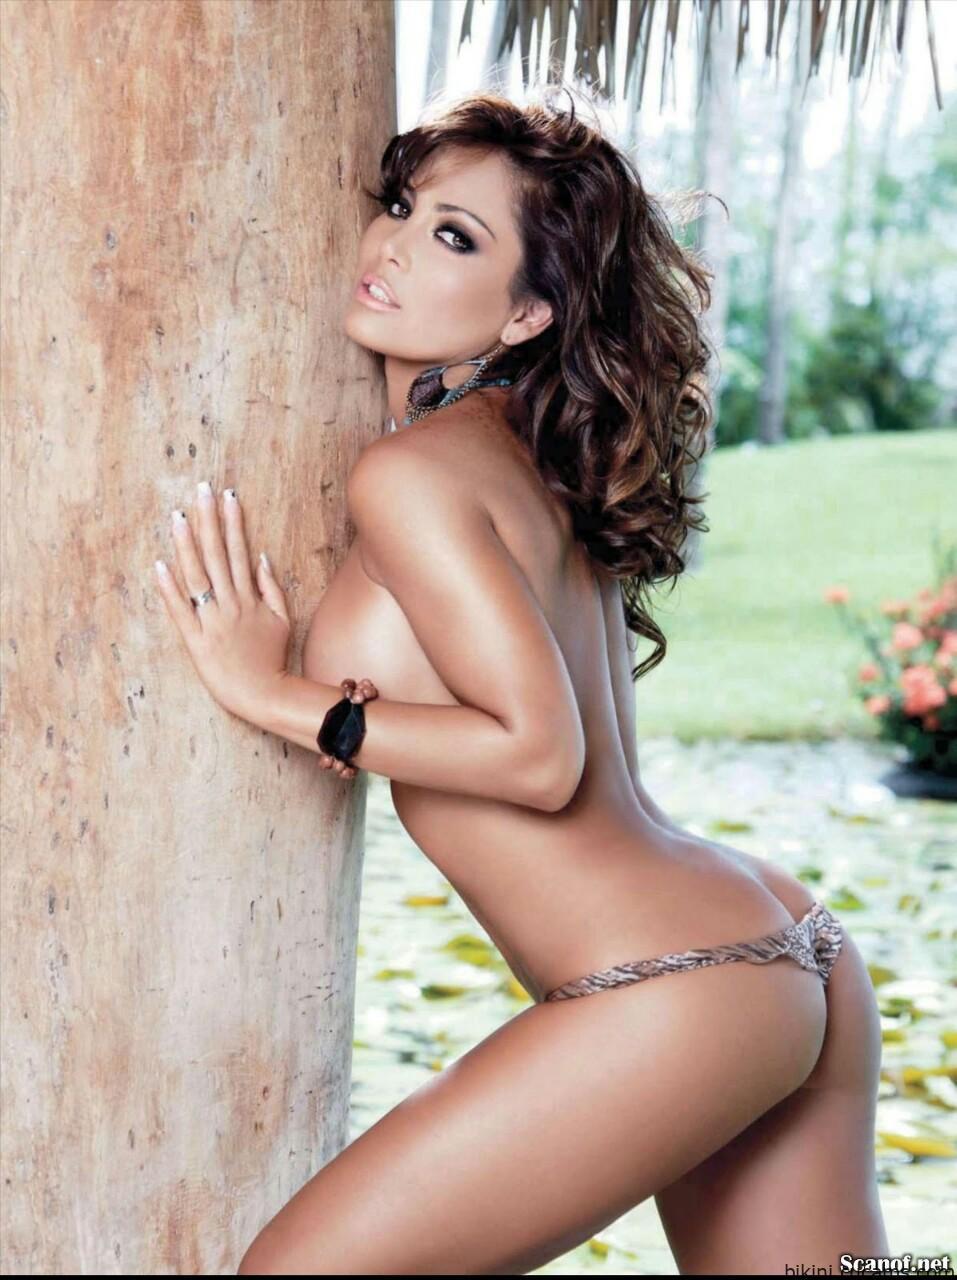 Bikini Tease Celebrity by bikini.cucams.com